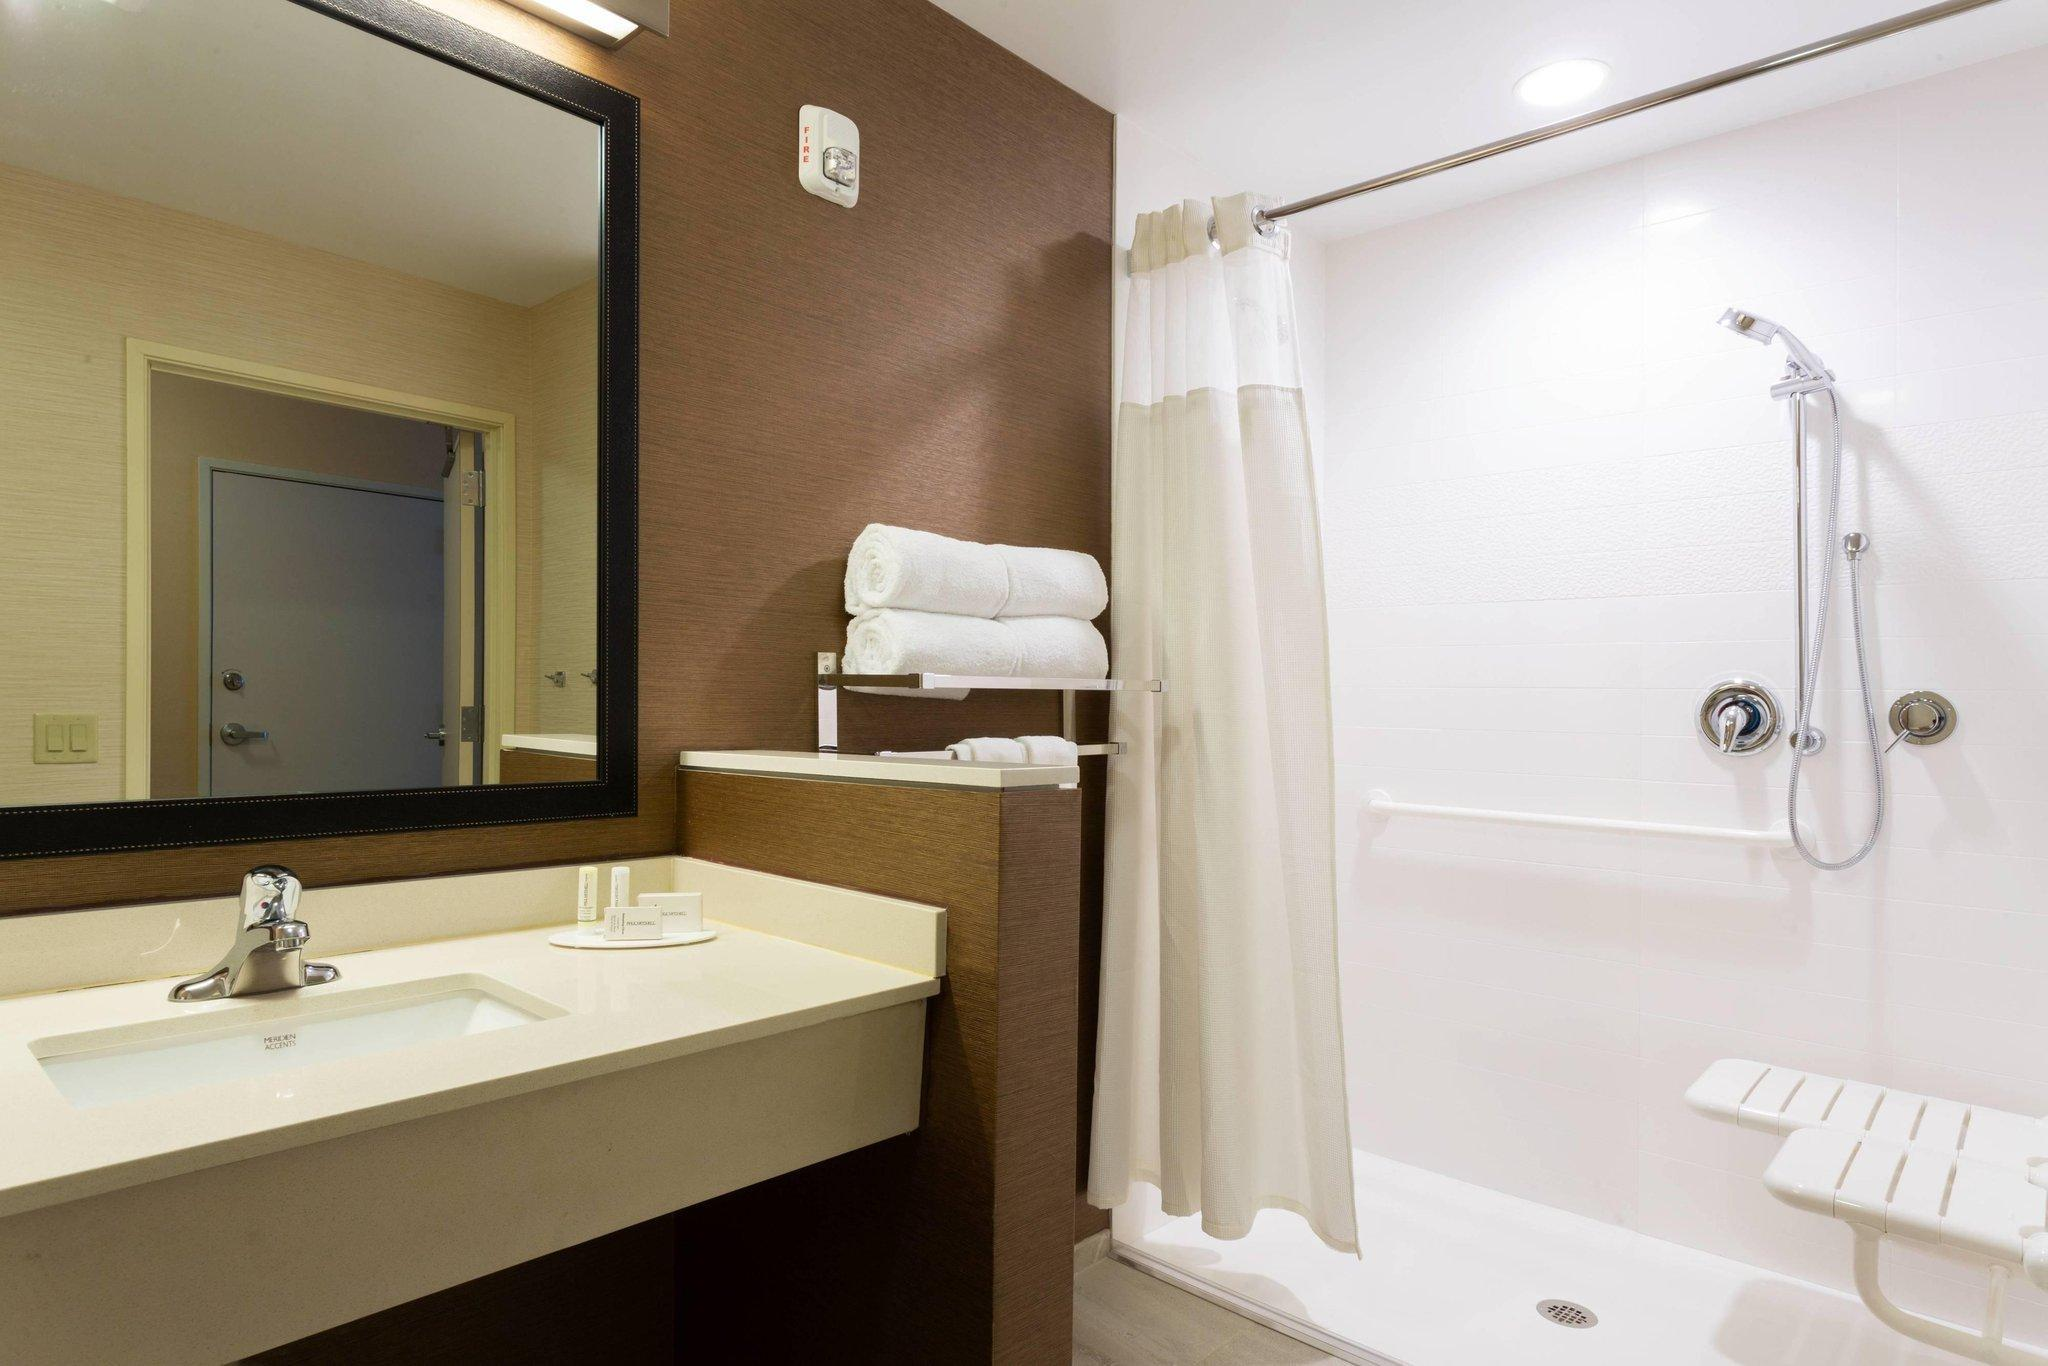 Fairfield Inn Suites Fort Lauderdale